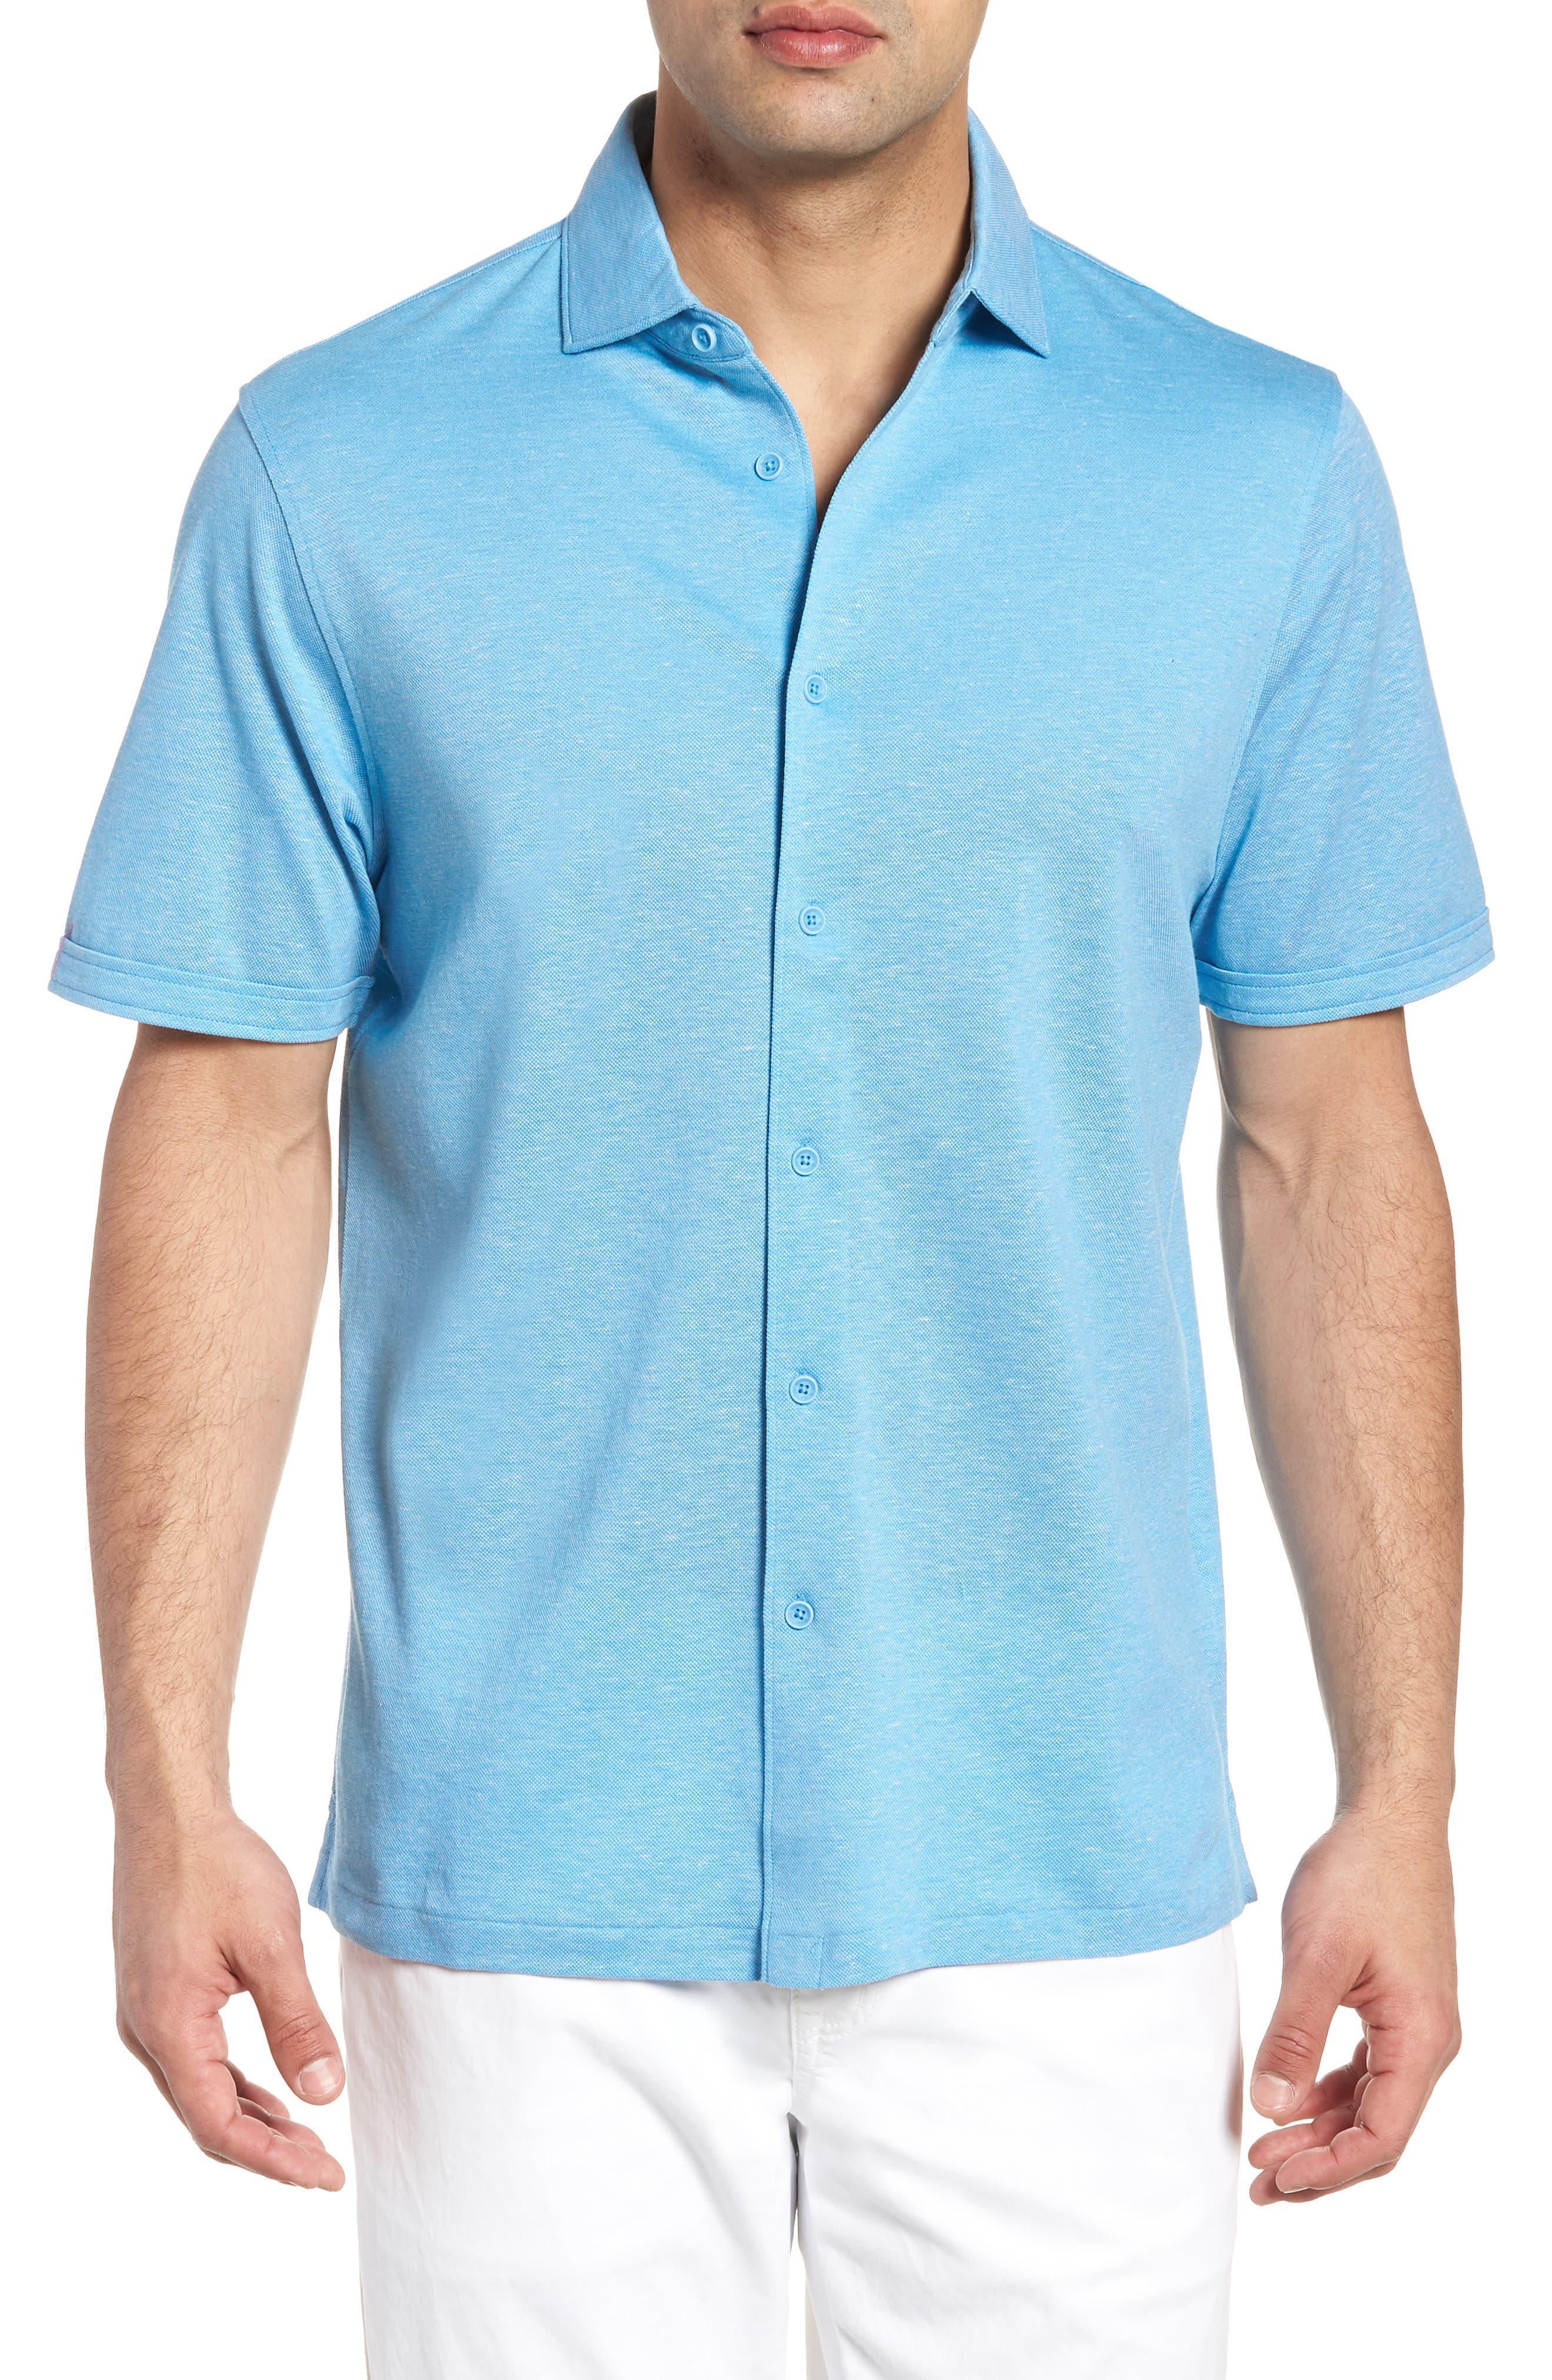 Regular Fit Heather Knit Sport Shirt,                         Main,                         color, Air Blue